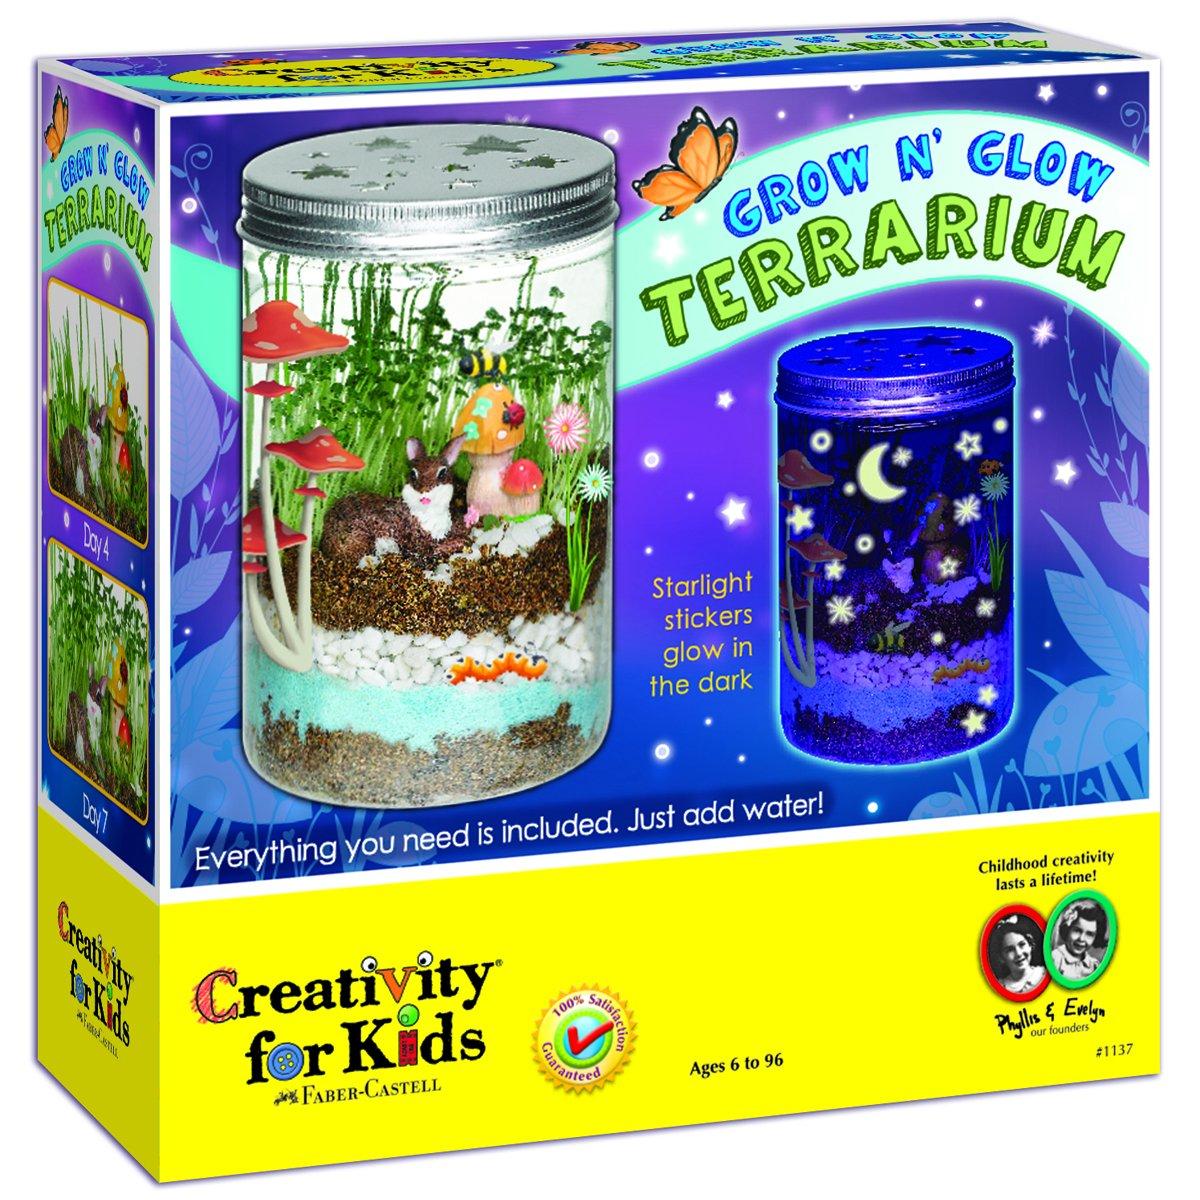 Creativity for Kids Grow 'n Glow Terrarium gifts girls age 6 7